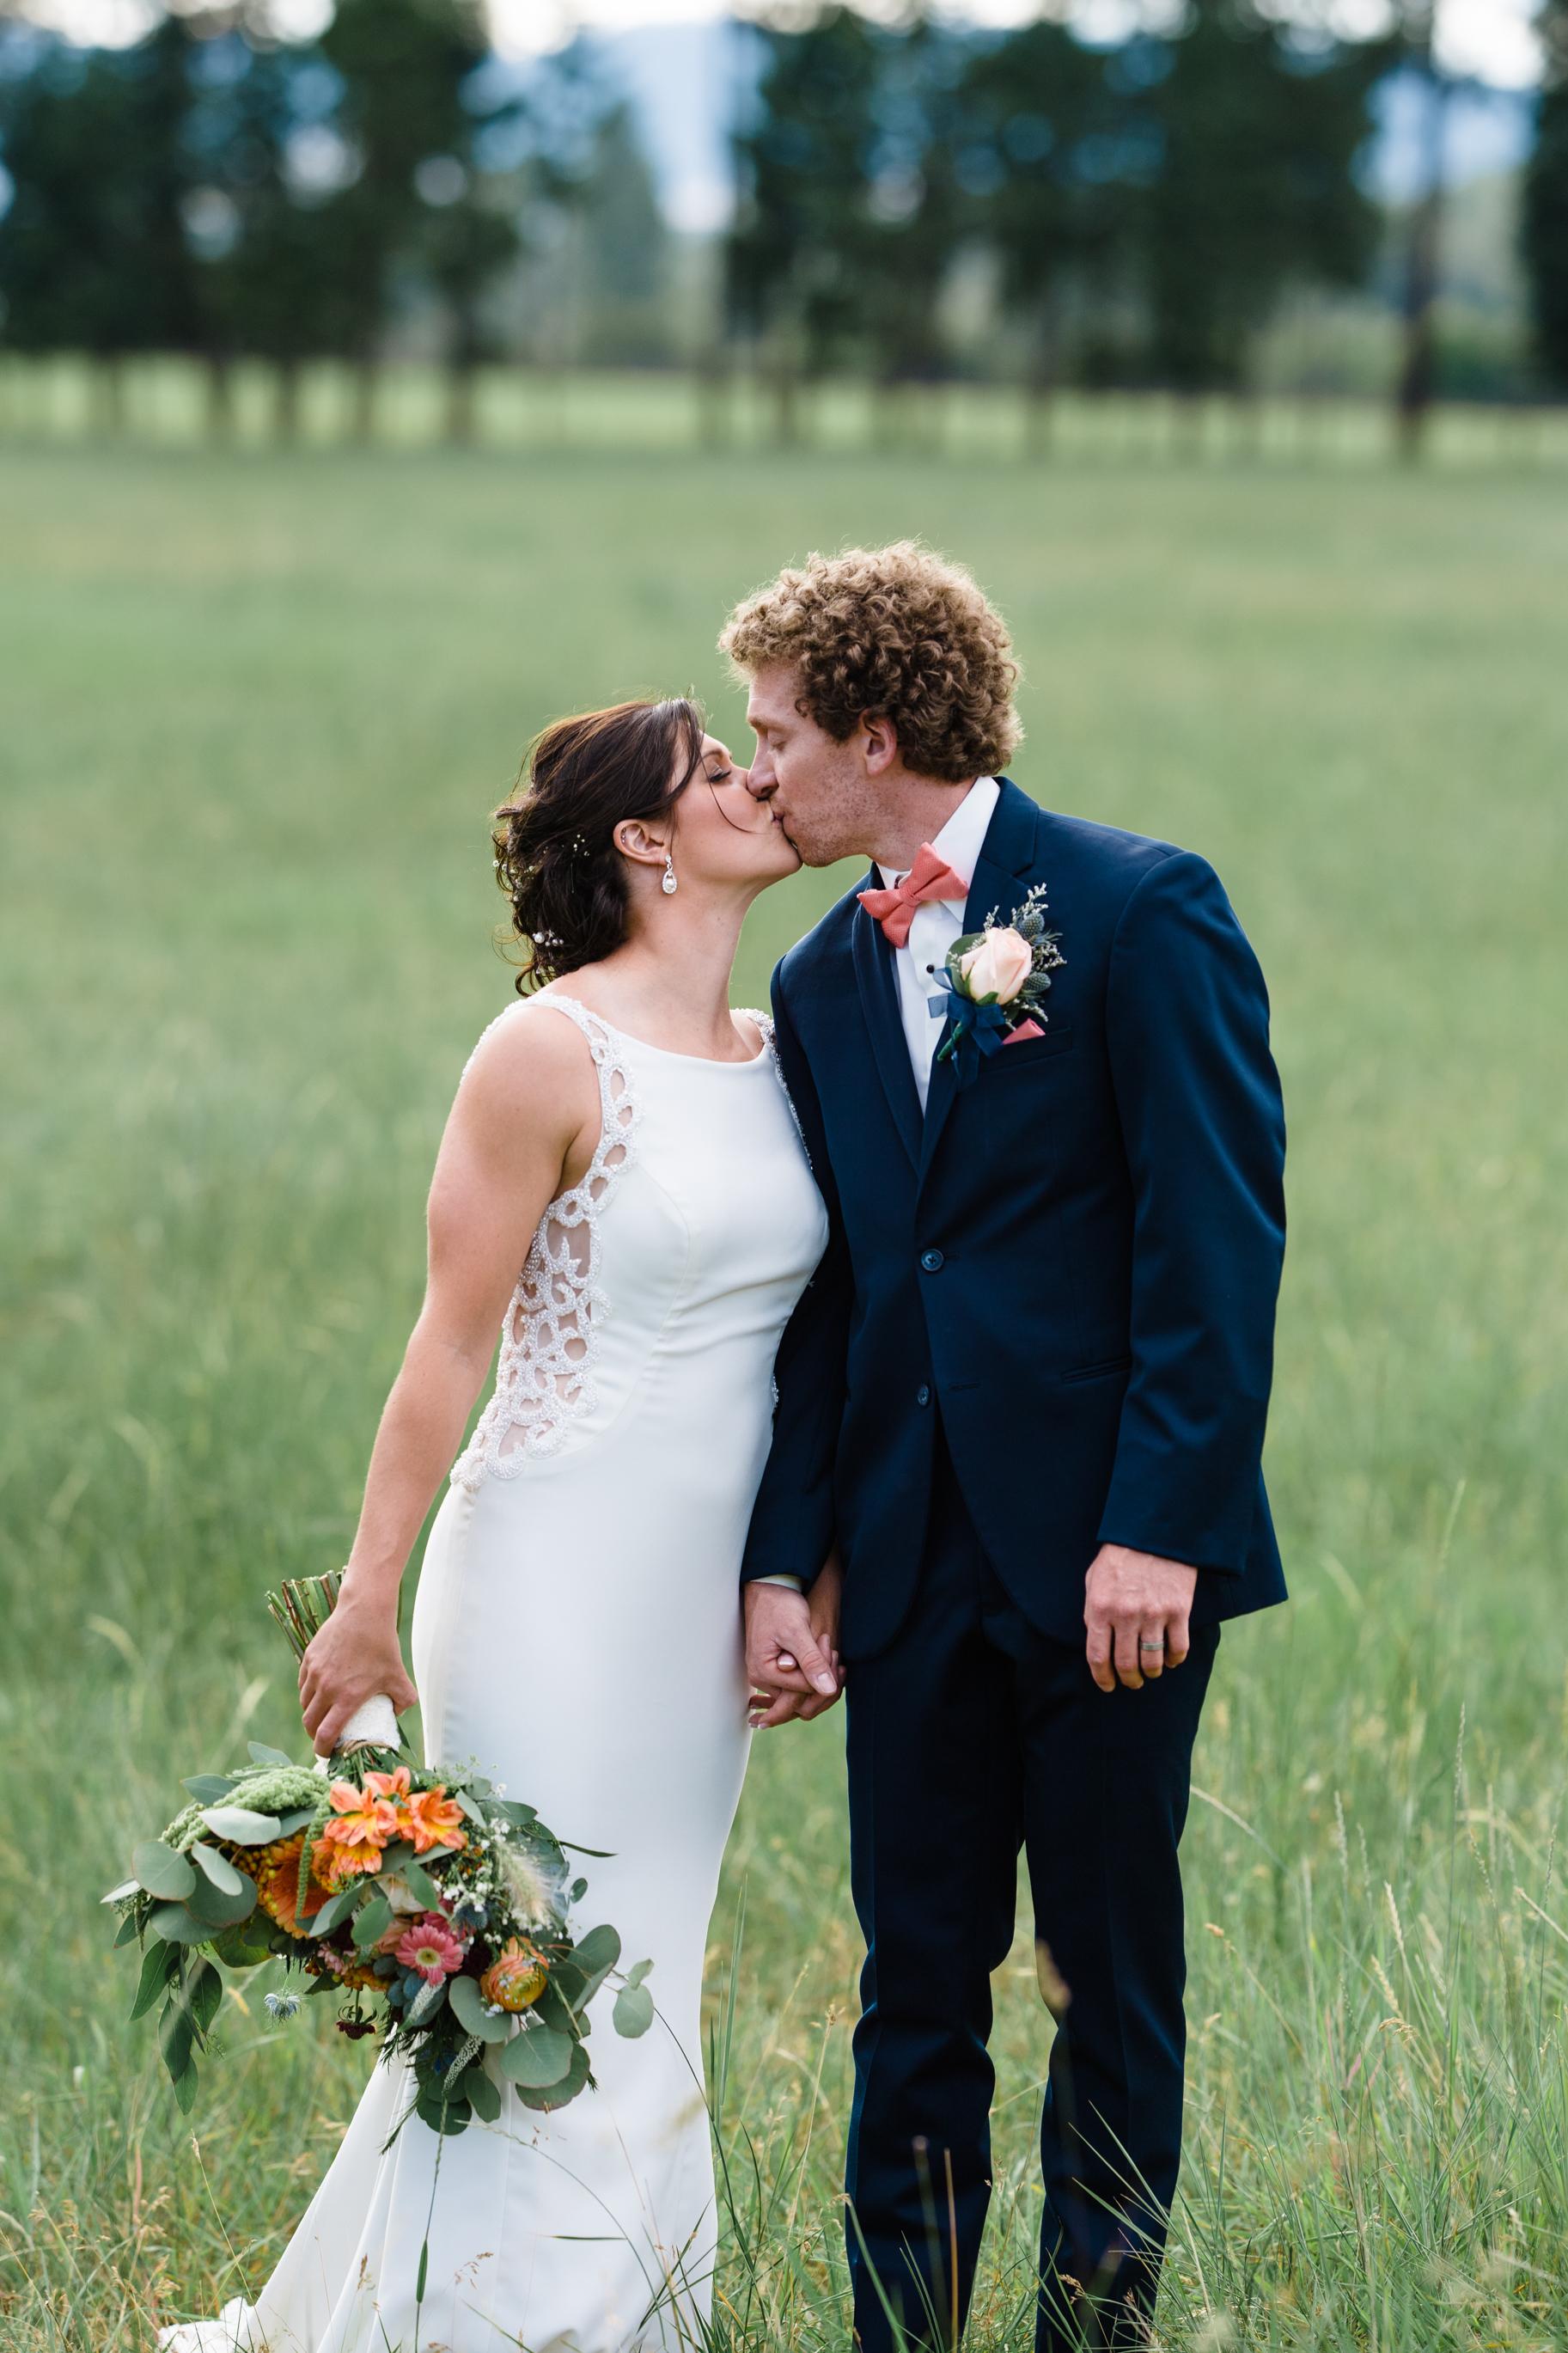 023The Barn at Finley Point Wedding_Montana Wedding Photographer_Katy & Bryce_July 20, 2019-502.jpg